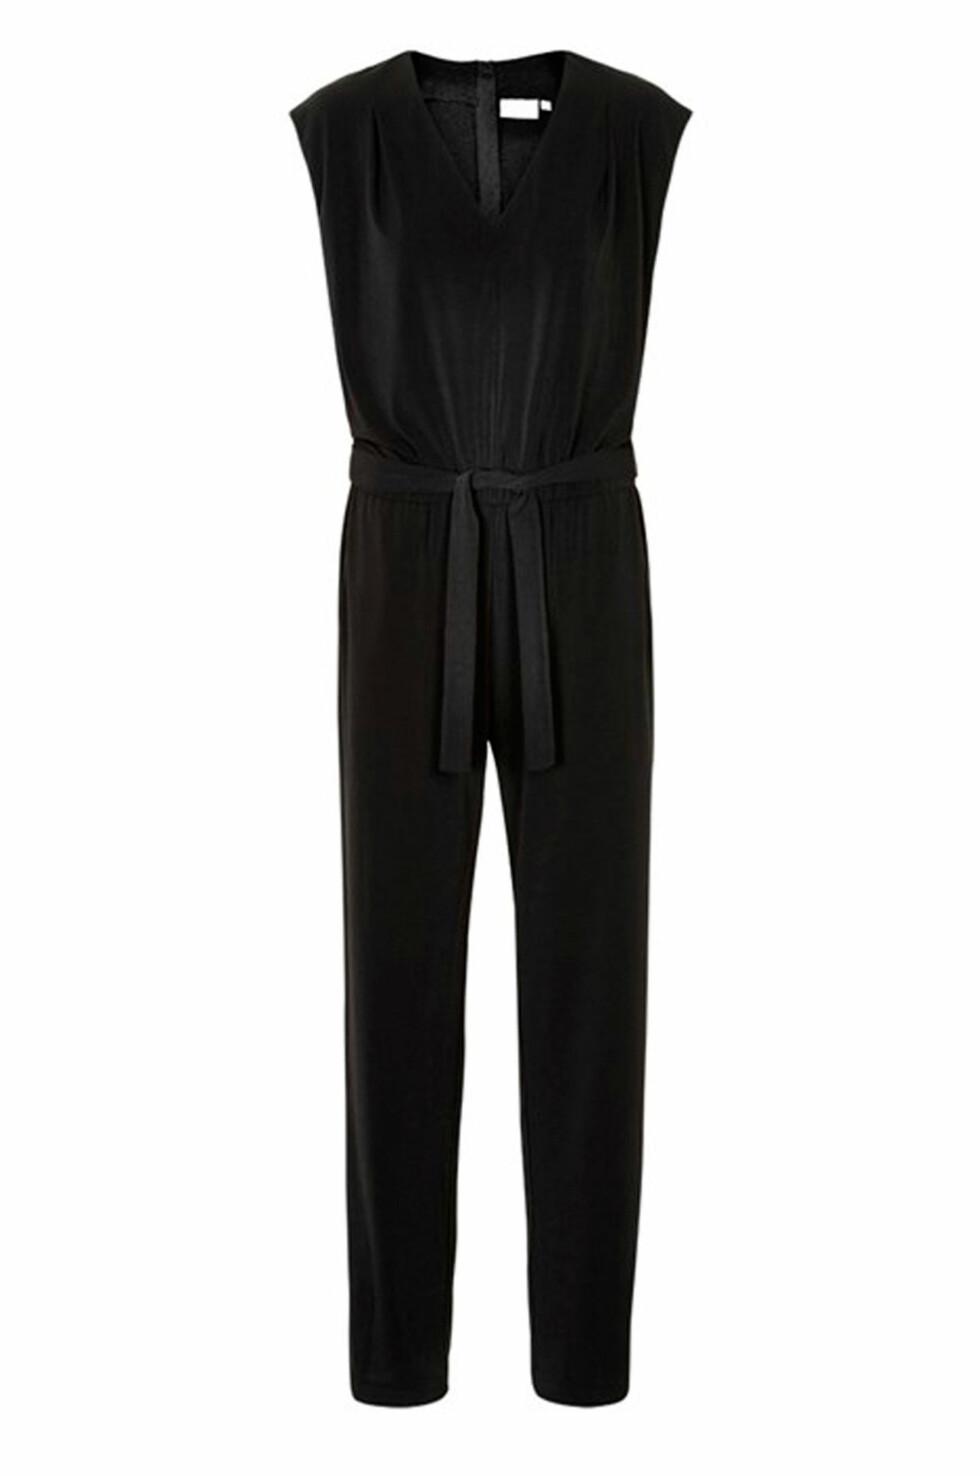 Jumpsuit fra Inwear via Ellos.no (20 prosent) | kr 960 | https://track.adtraction.com/t/t?a=1068408670&as=1115634940&t=2&tk=1&url=http://www.ellos.no/inwear/jumpsuit-tilly/542417?N=1z13teqZ1z141pu&Ns=RankValue4|1&Nao=16&selArt=325044&pr=0S1B2C3T